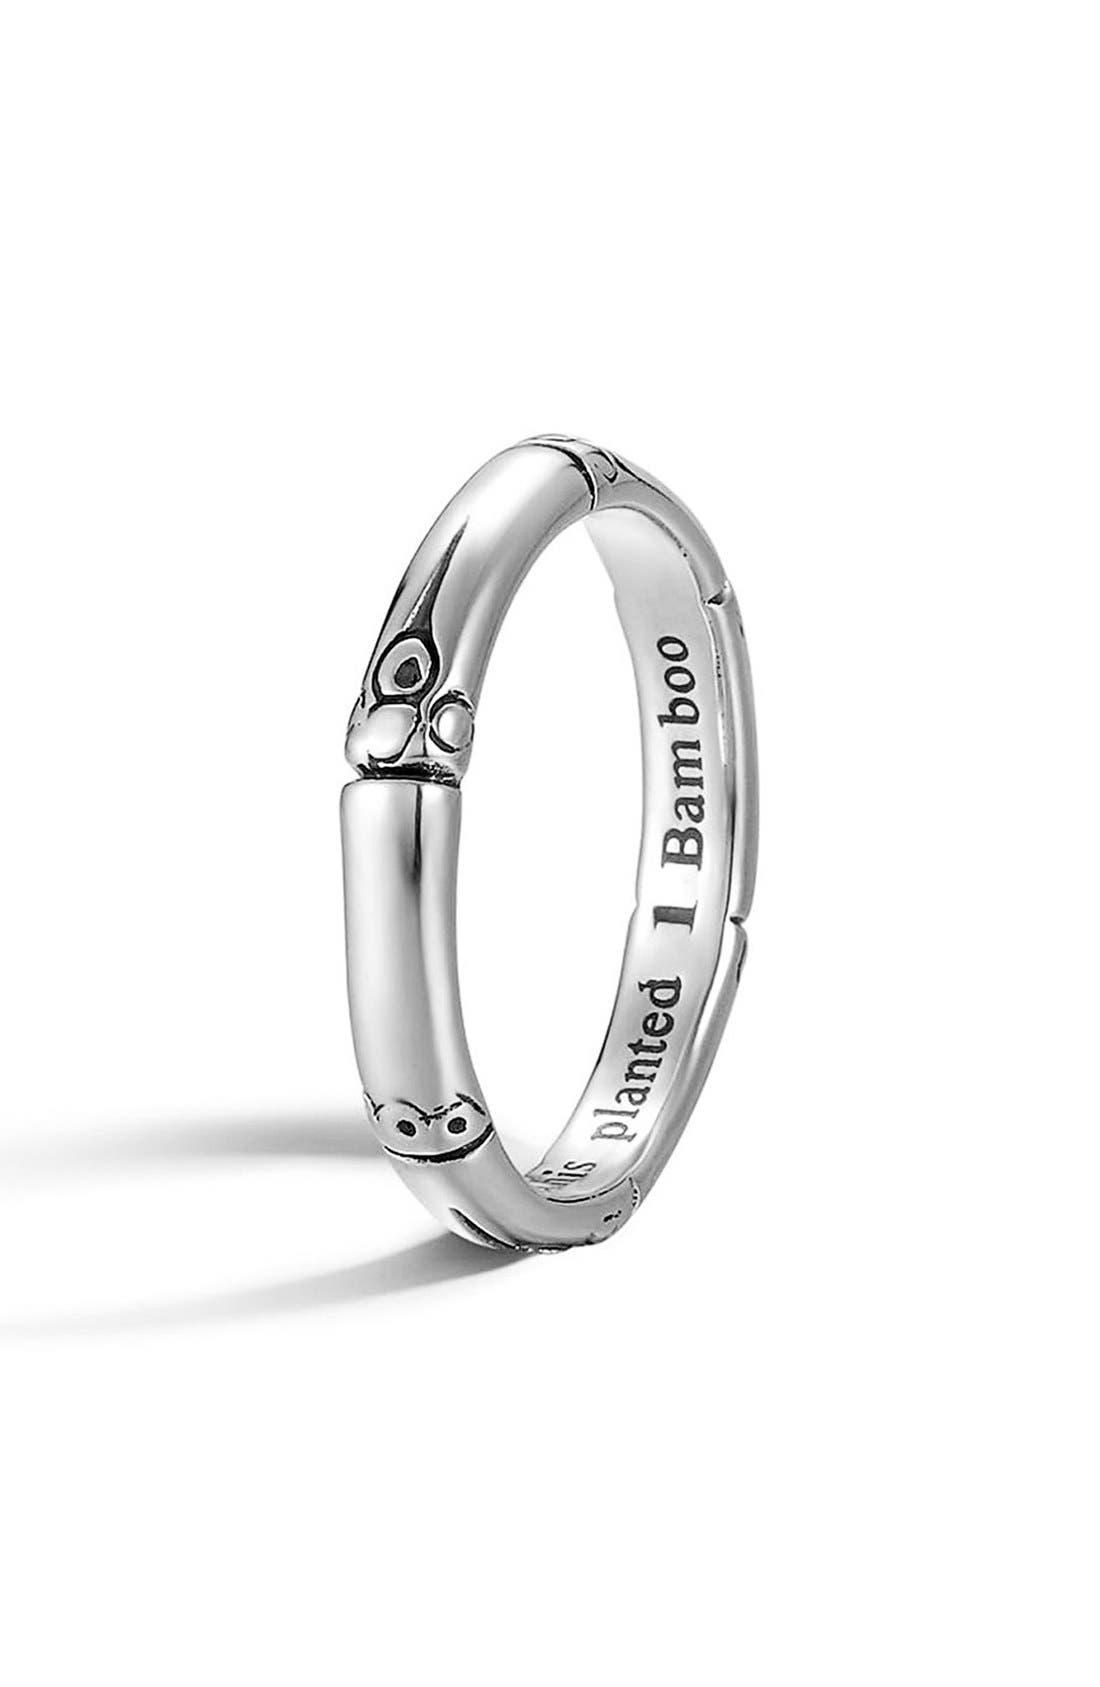 JOHN HARDY Bamboo Silver Ring